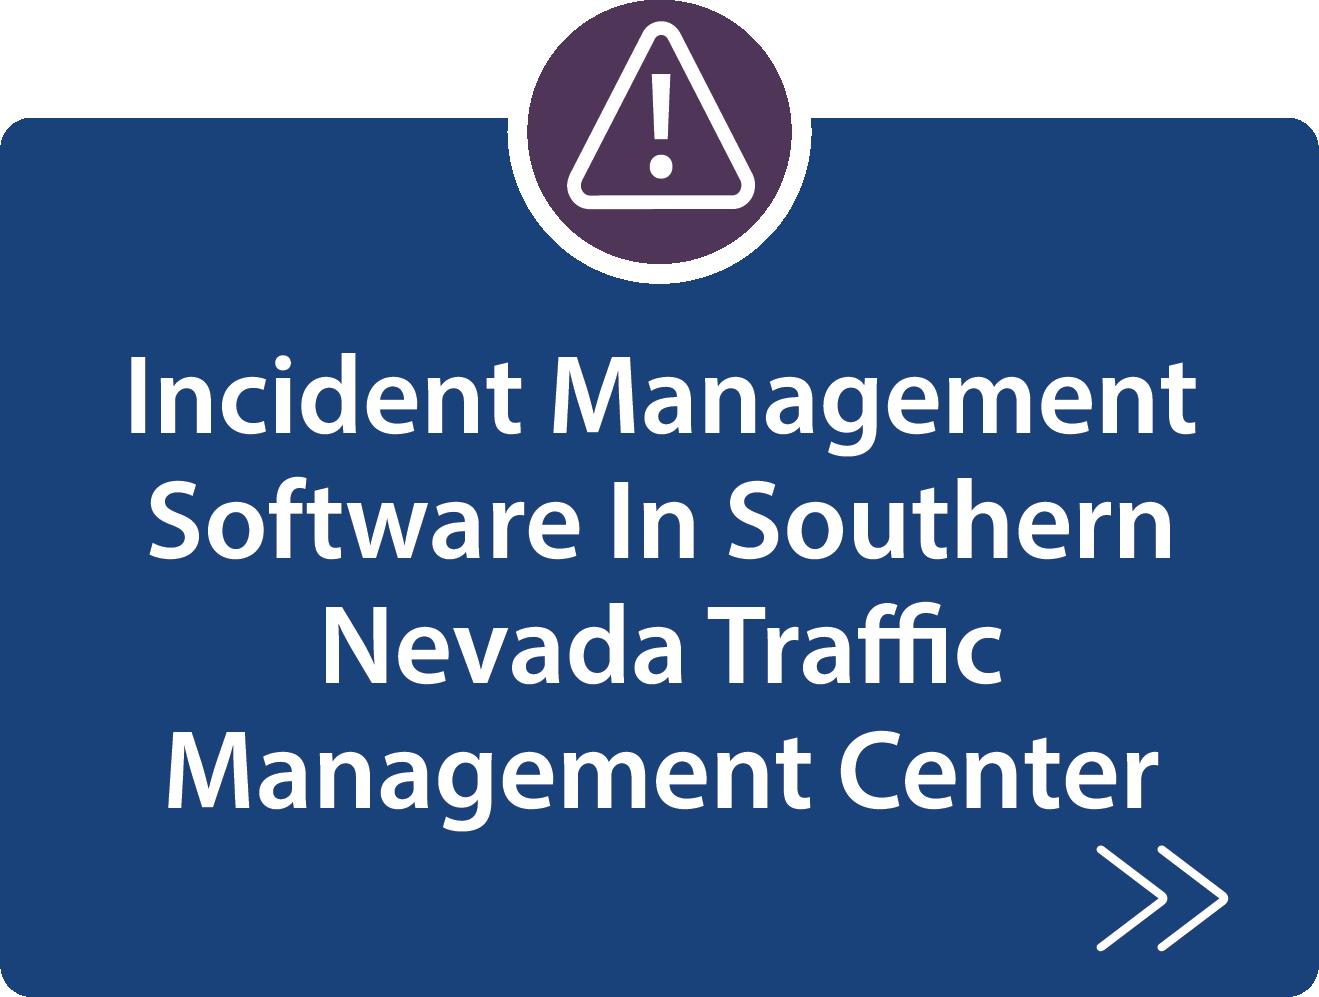 Incident management Software in Southern Nevada Traffic Management Center description